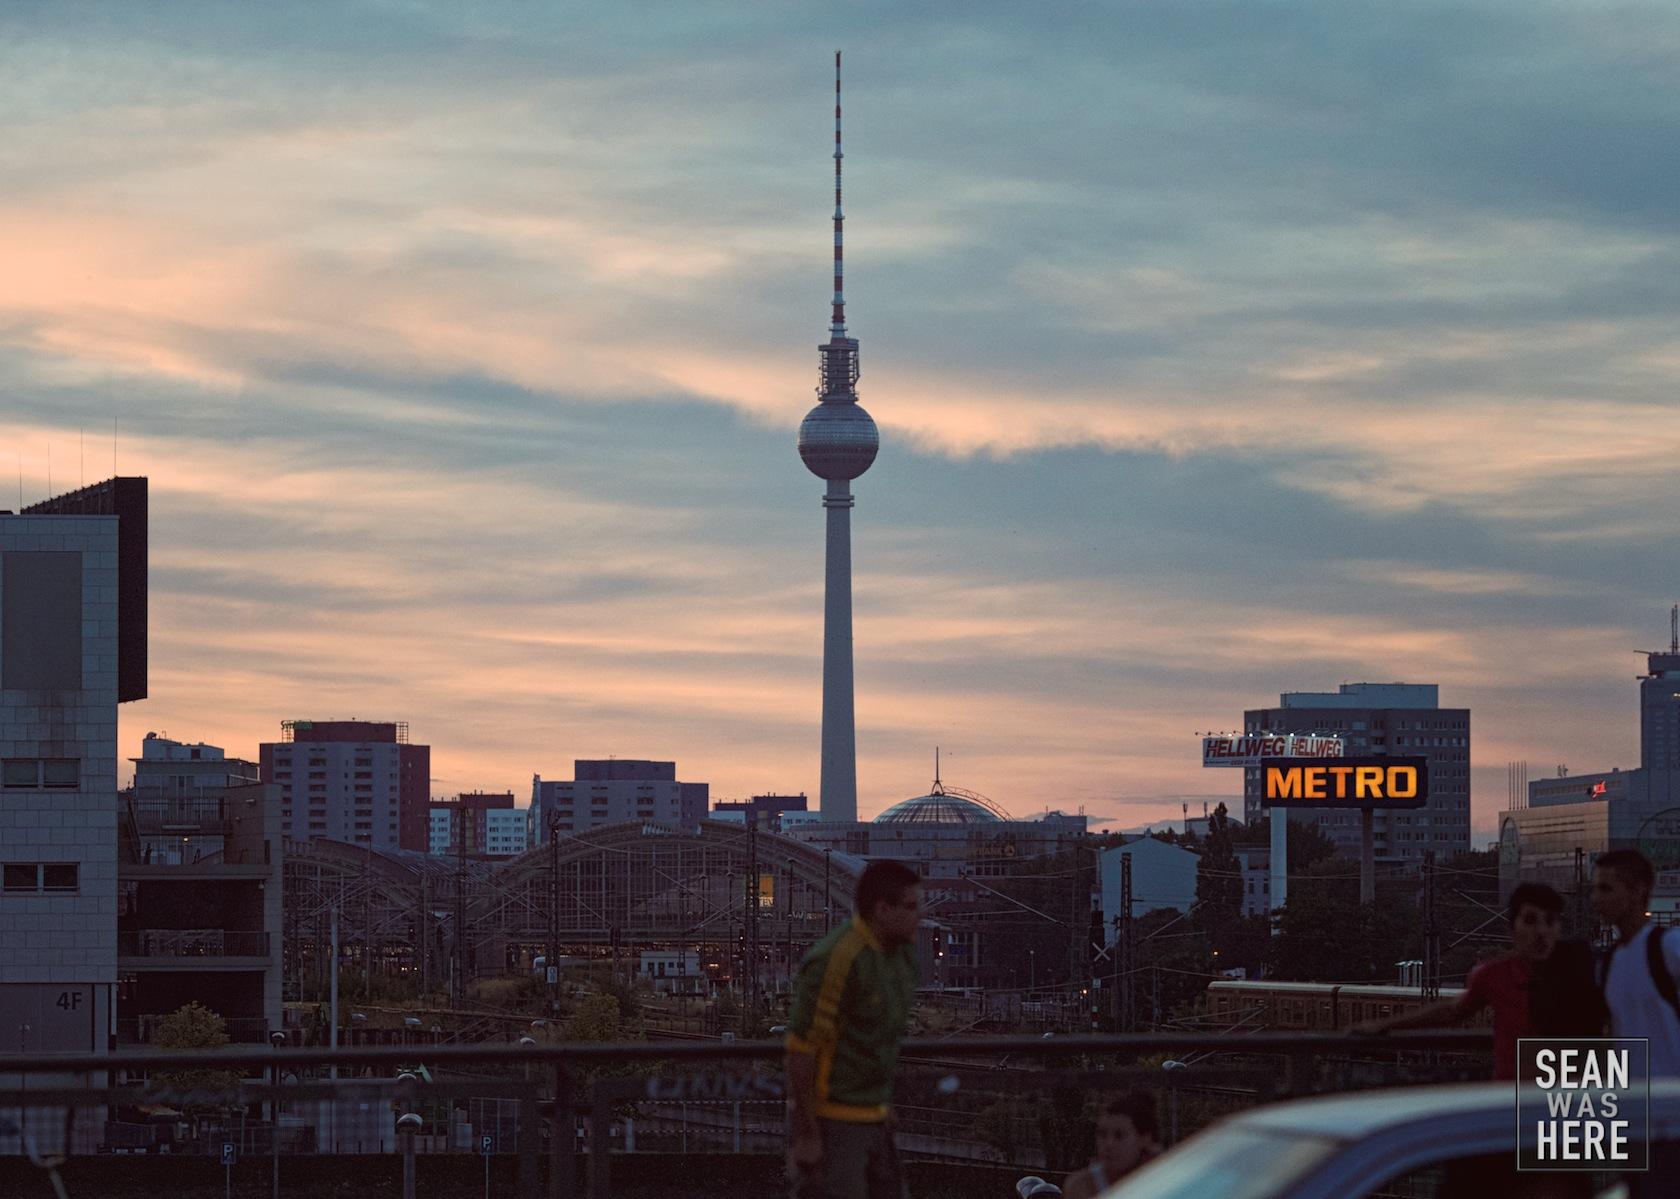 Berliner Fernsehturm Tower at Sunset. Berlin, Germany